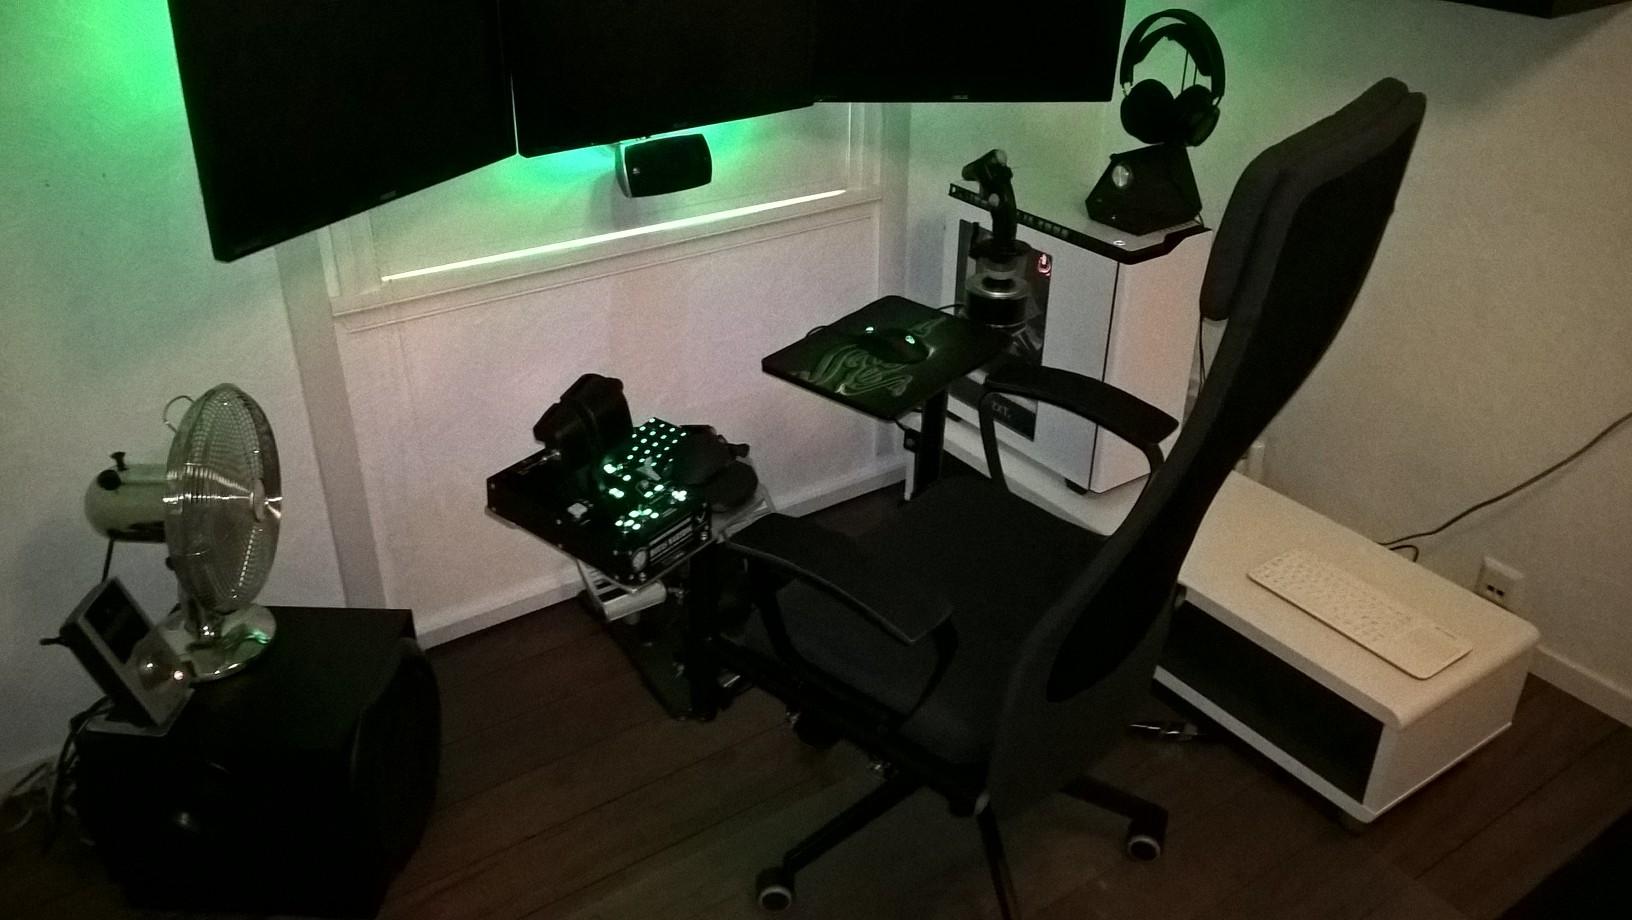 Bygge battlestationcombat flight simulator stol. Side 2